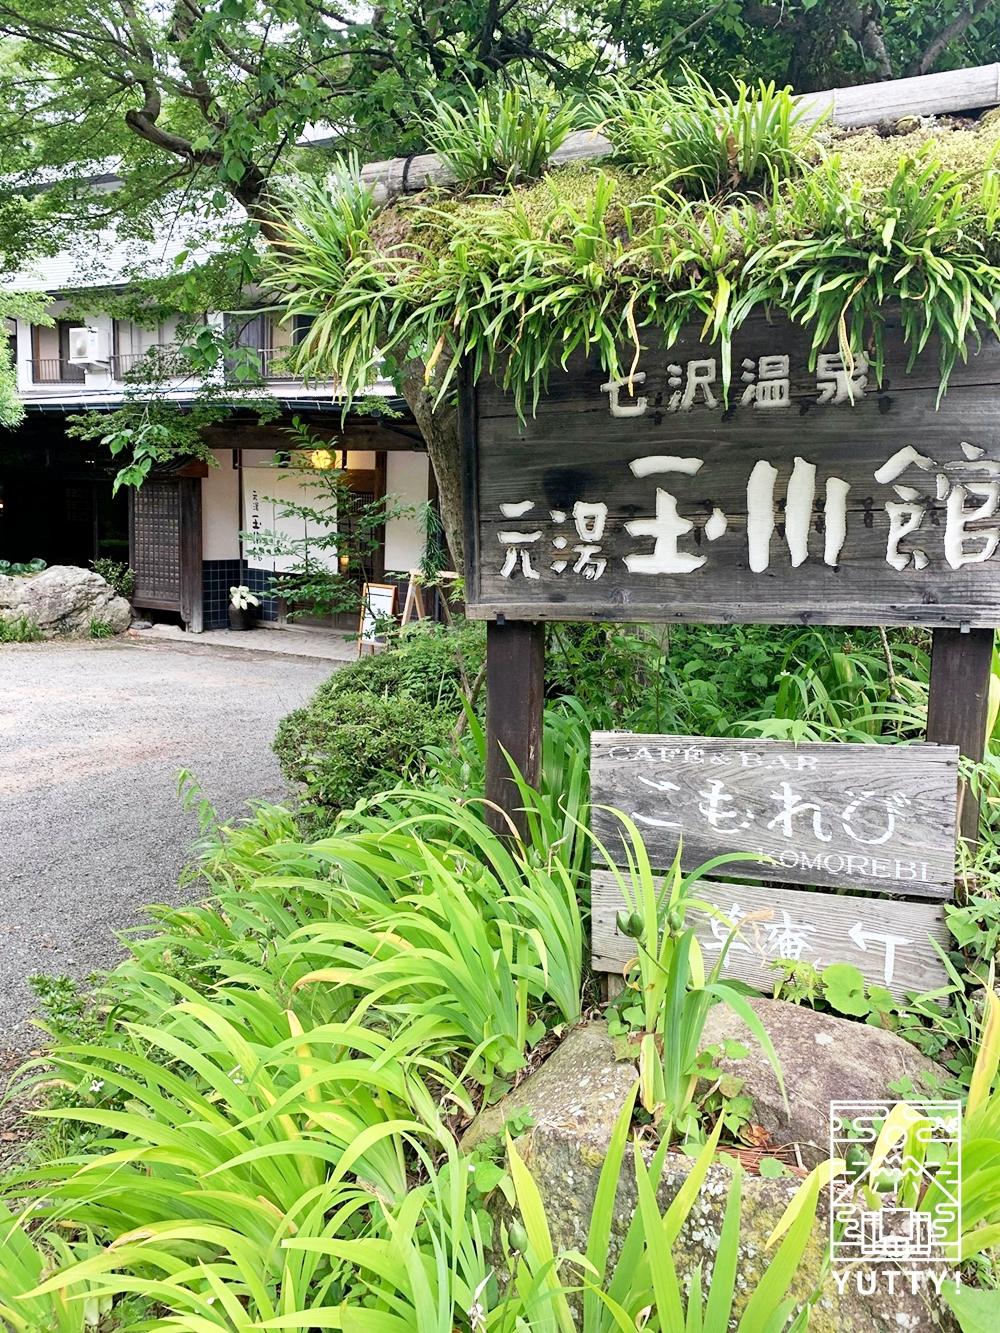 七沢温泉元湯玉川館の入り口